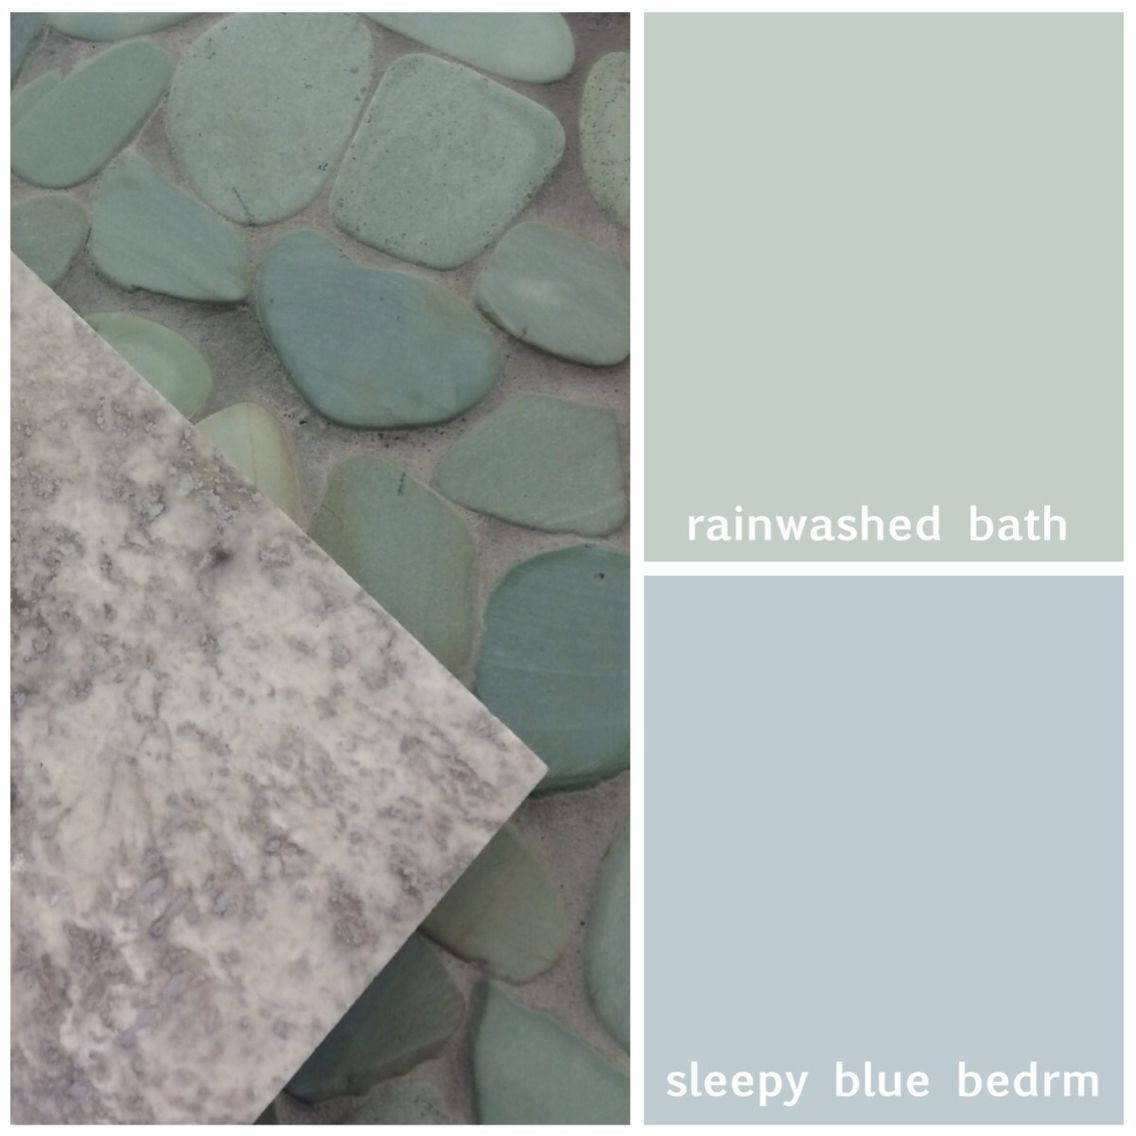 Sherwin Williams Sleepy Blue Bathroom: SW Rainwashed In Bathroom. Sleepy Blue In Bedroom. Sliced